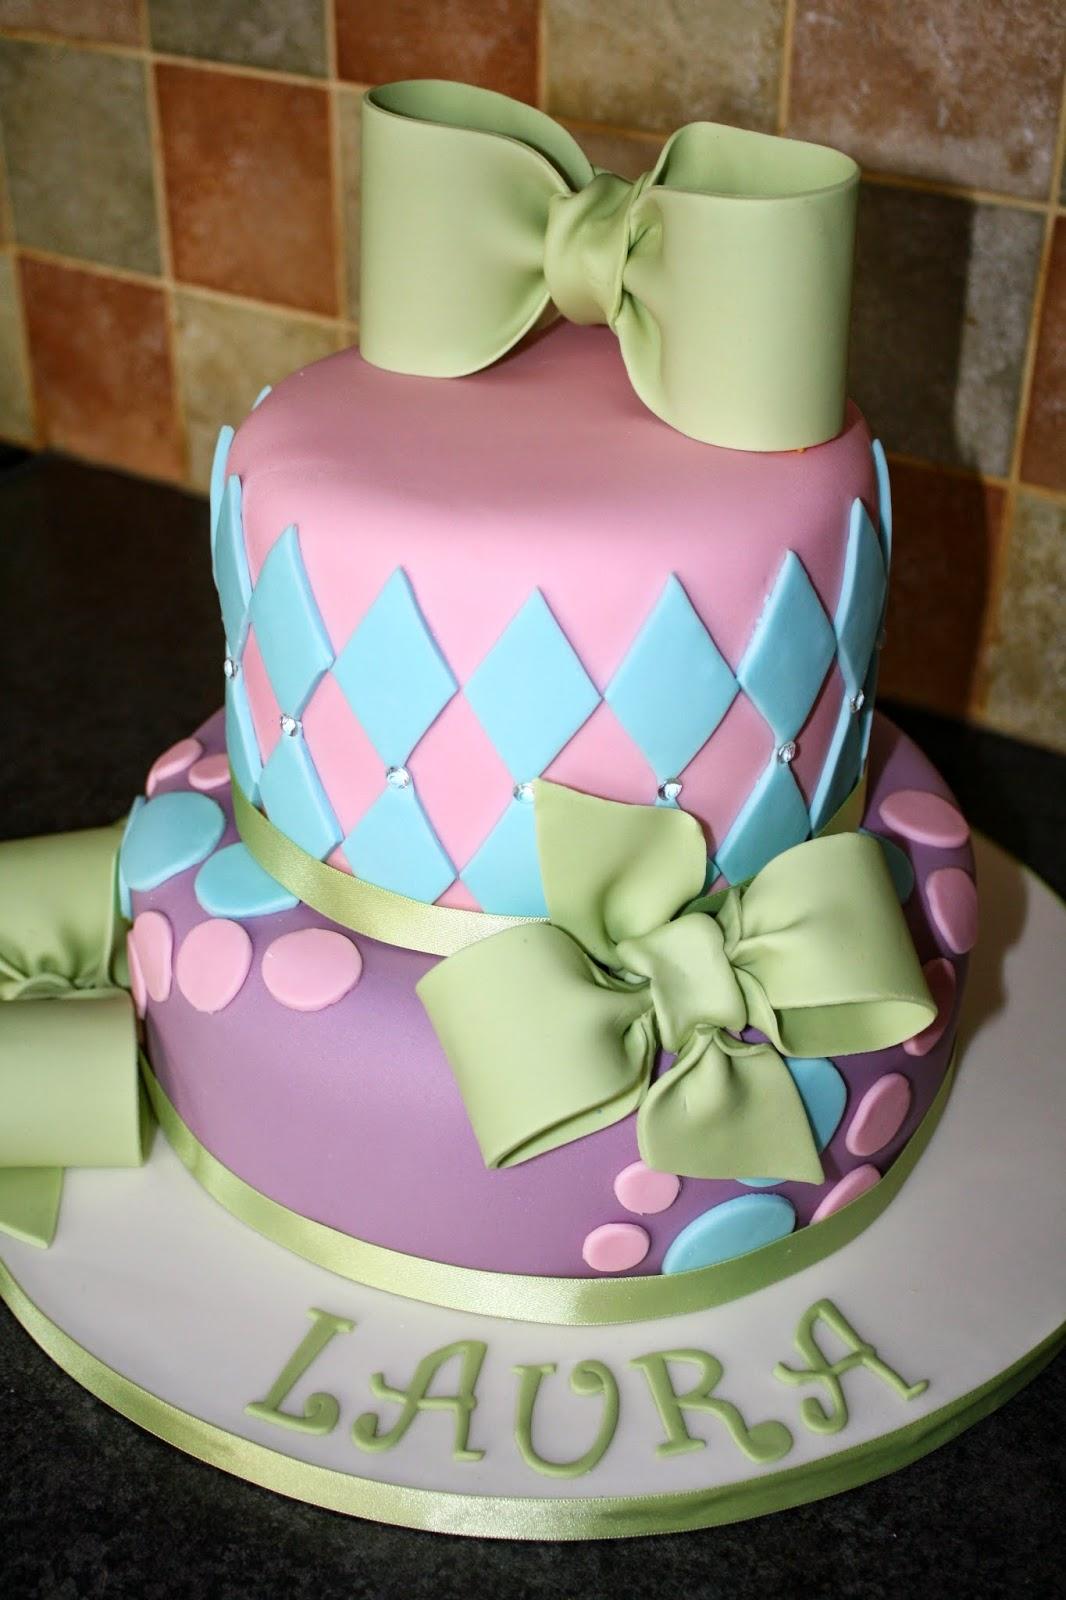 Tallulah S Bakery A Pretty Pastel 40th Birthday Cake